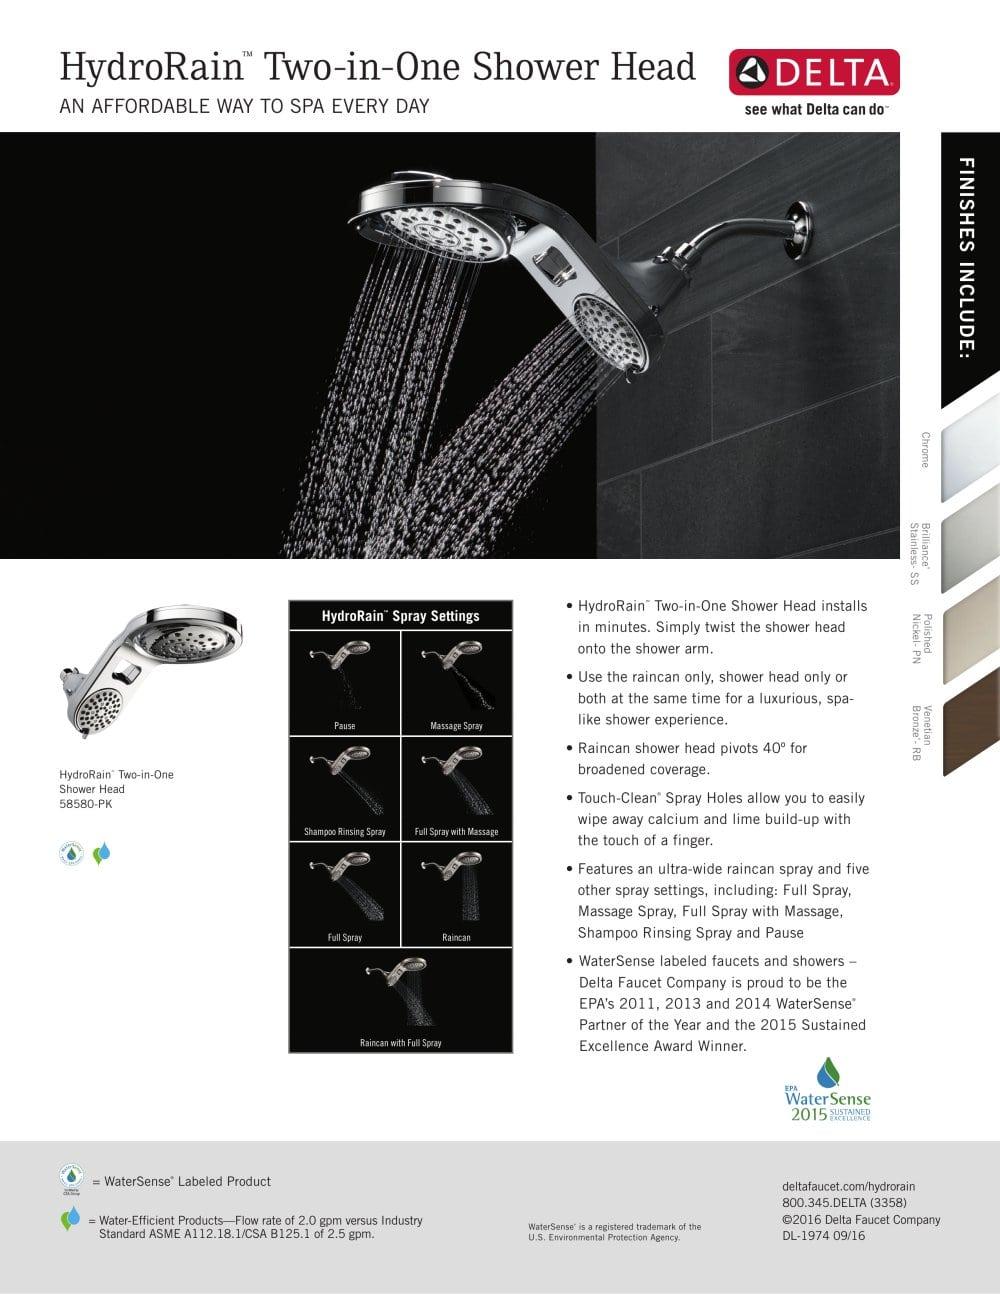 Hydrorain Sell Sheet - Delta - PDF Catalogues | Documentation ...